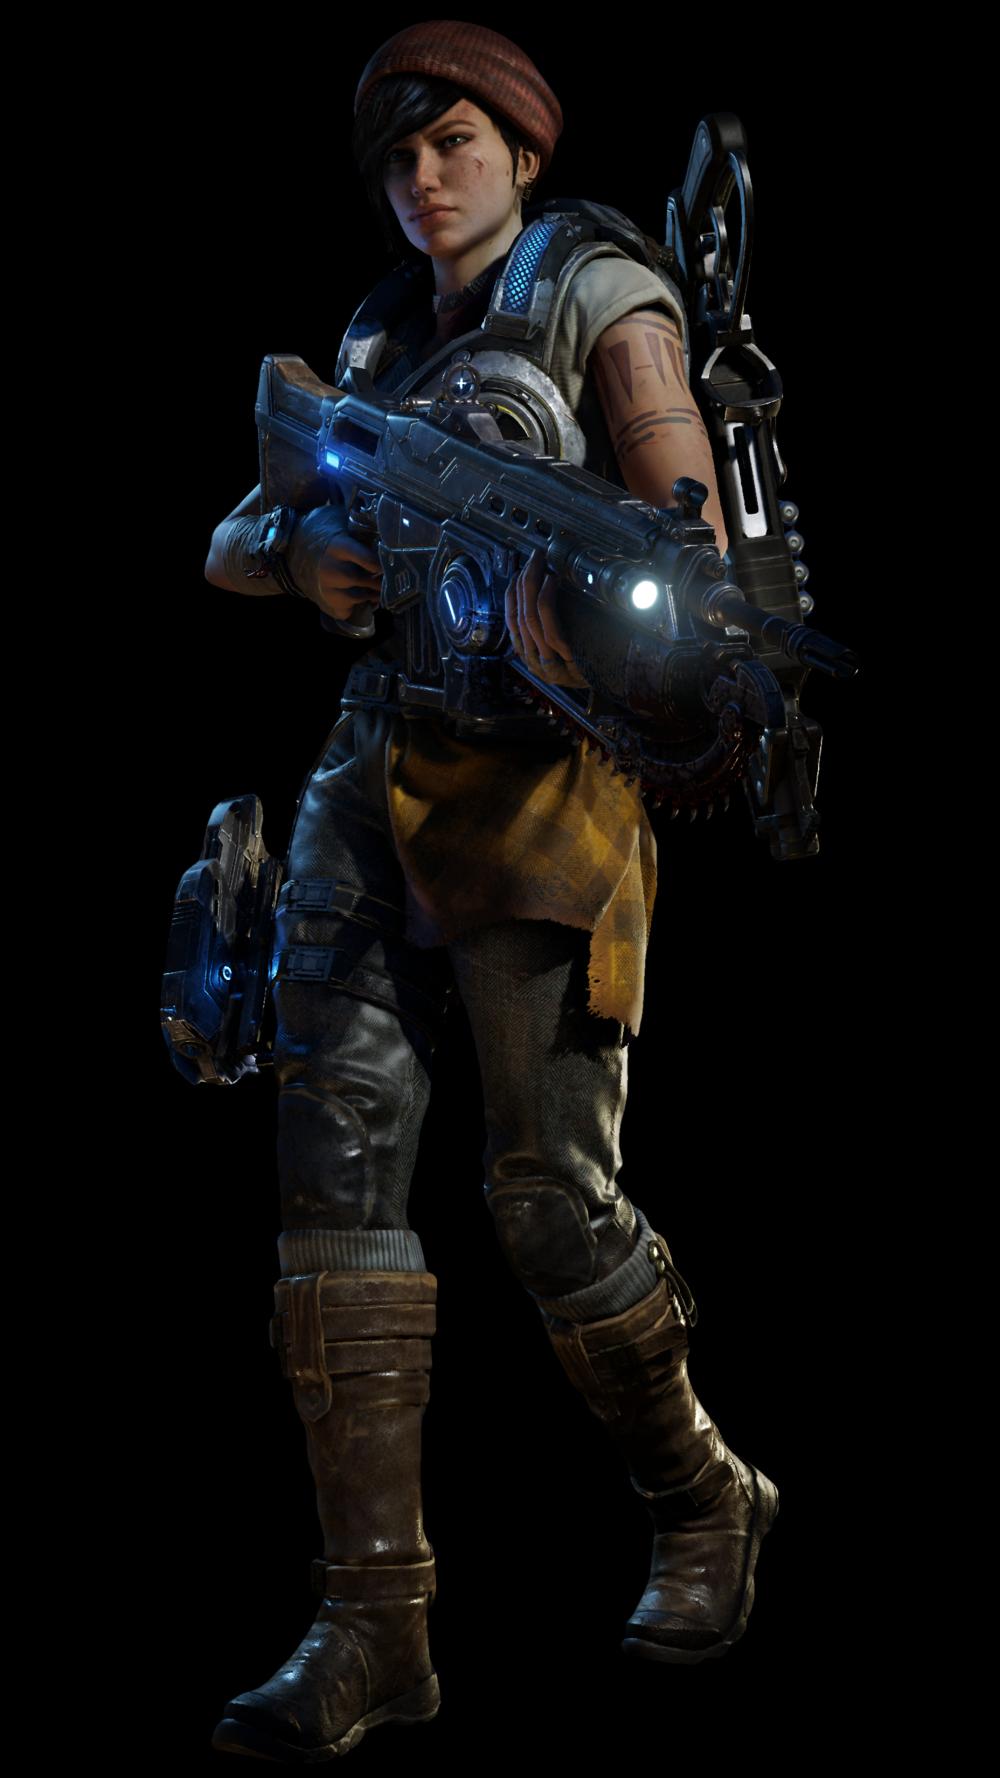 gears_of_war_4_char_rend_art (5)